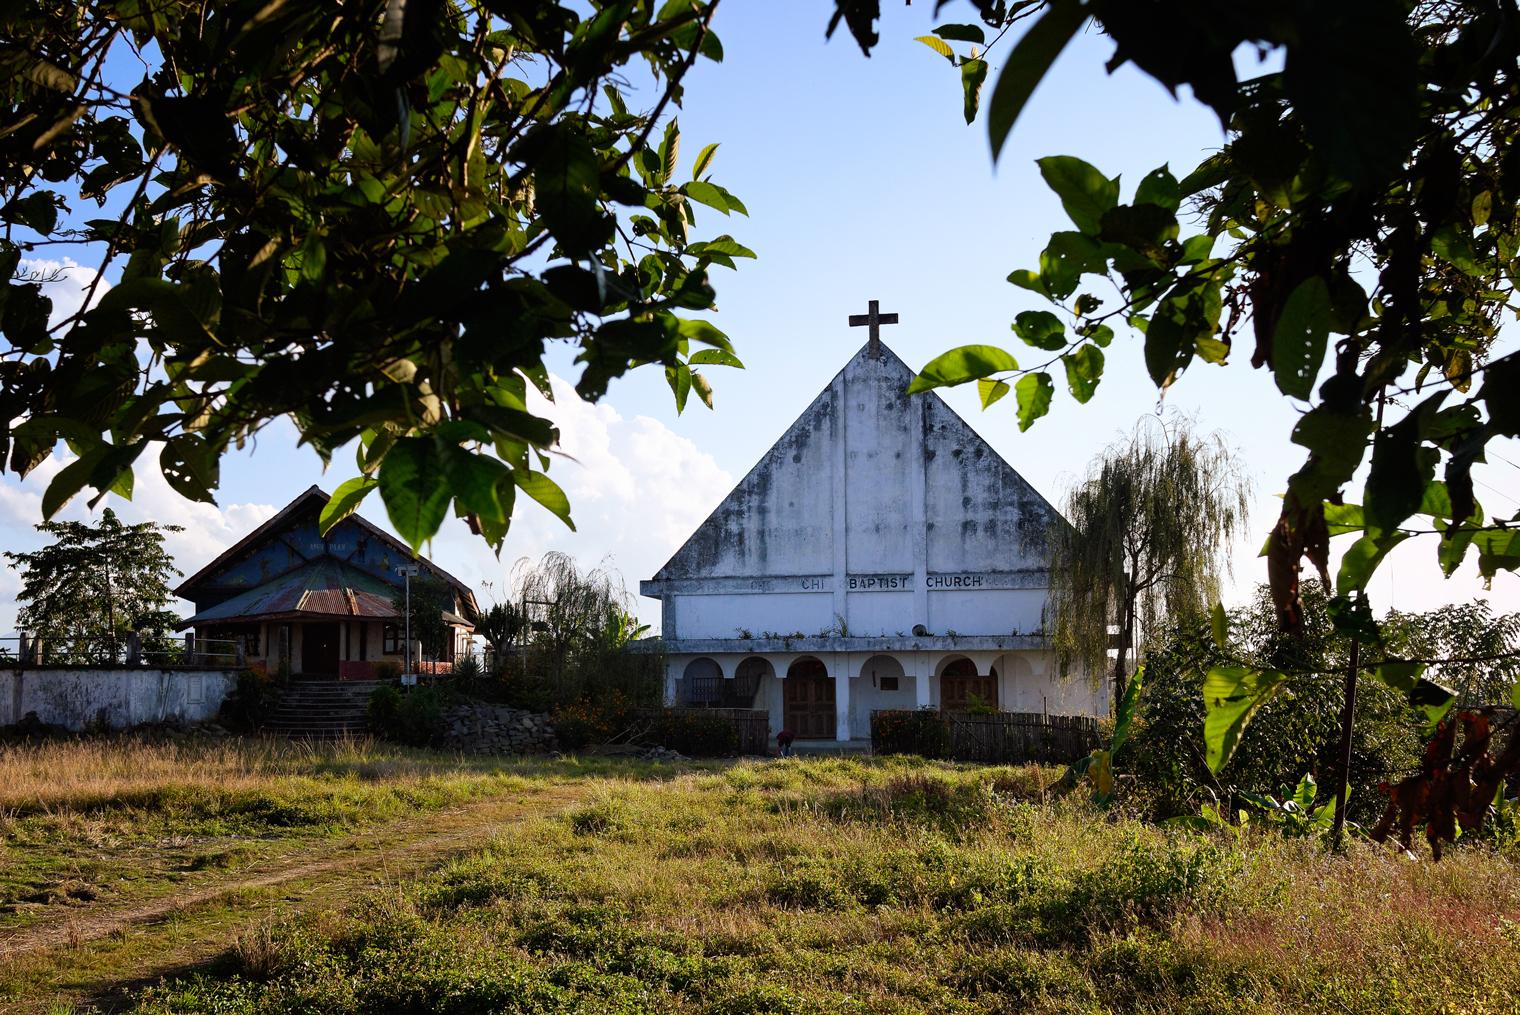 The Baptist Church in Chui